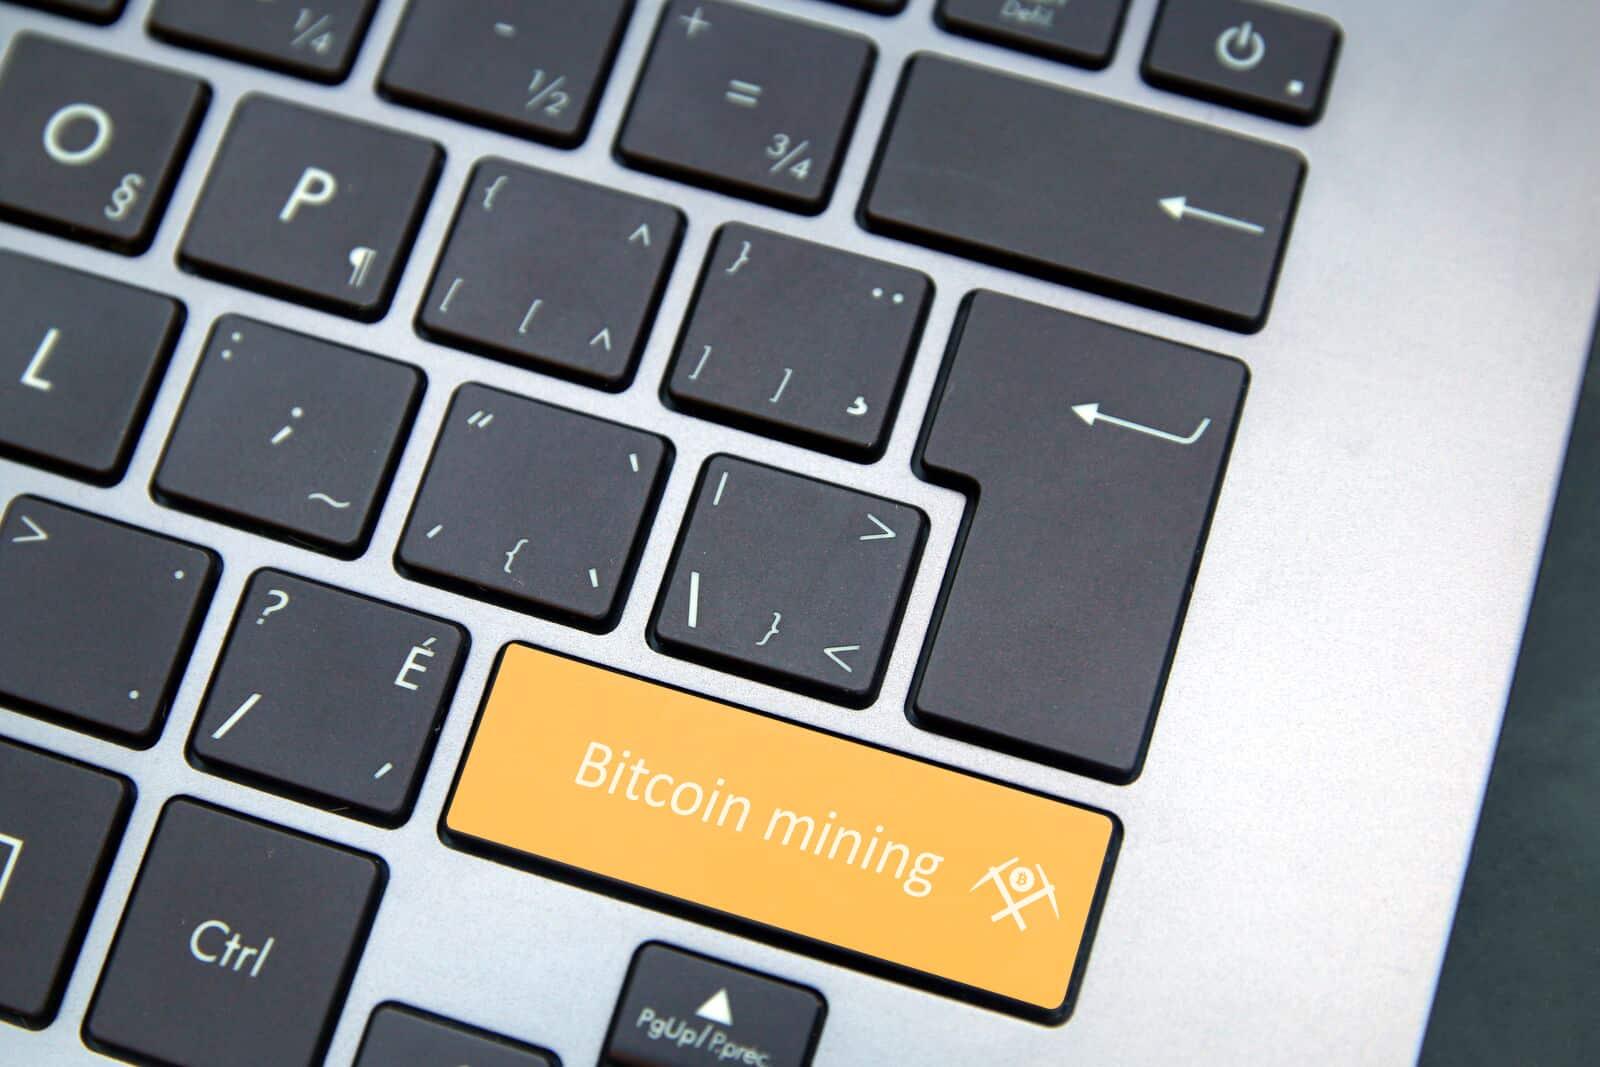 Get 1 Dollar Bitcoin Free Do You Need Bitcoins Hardware To